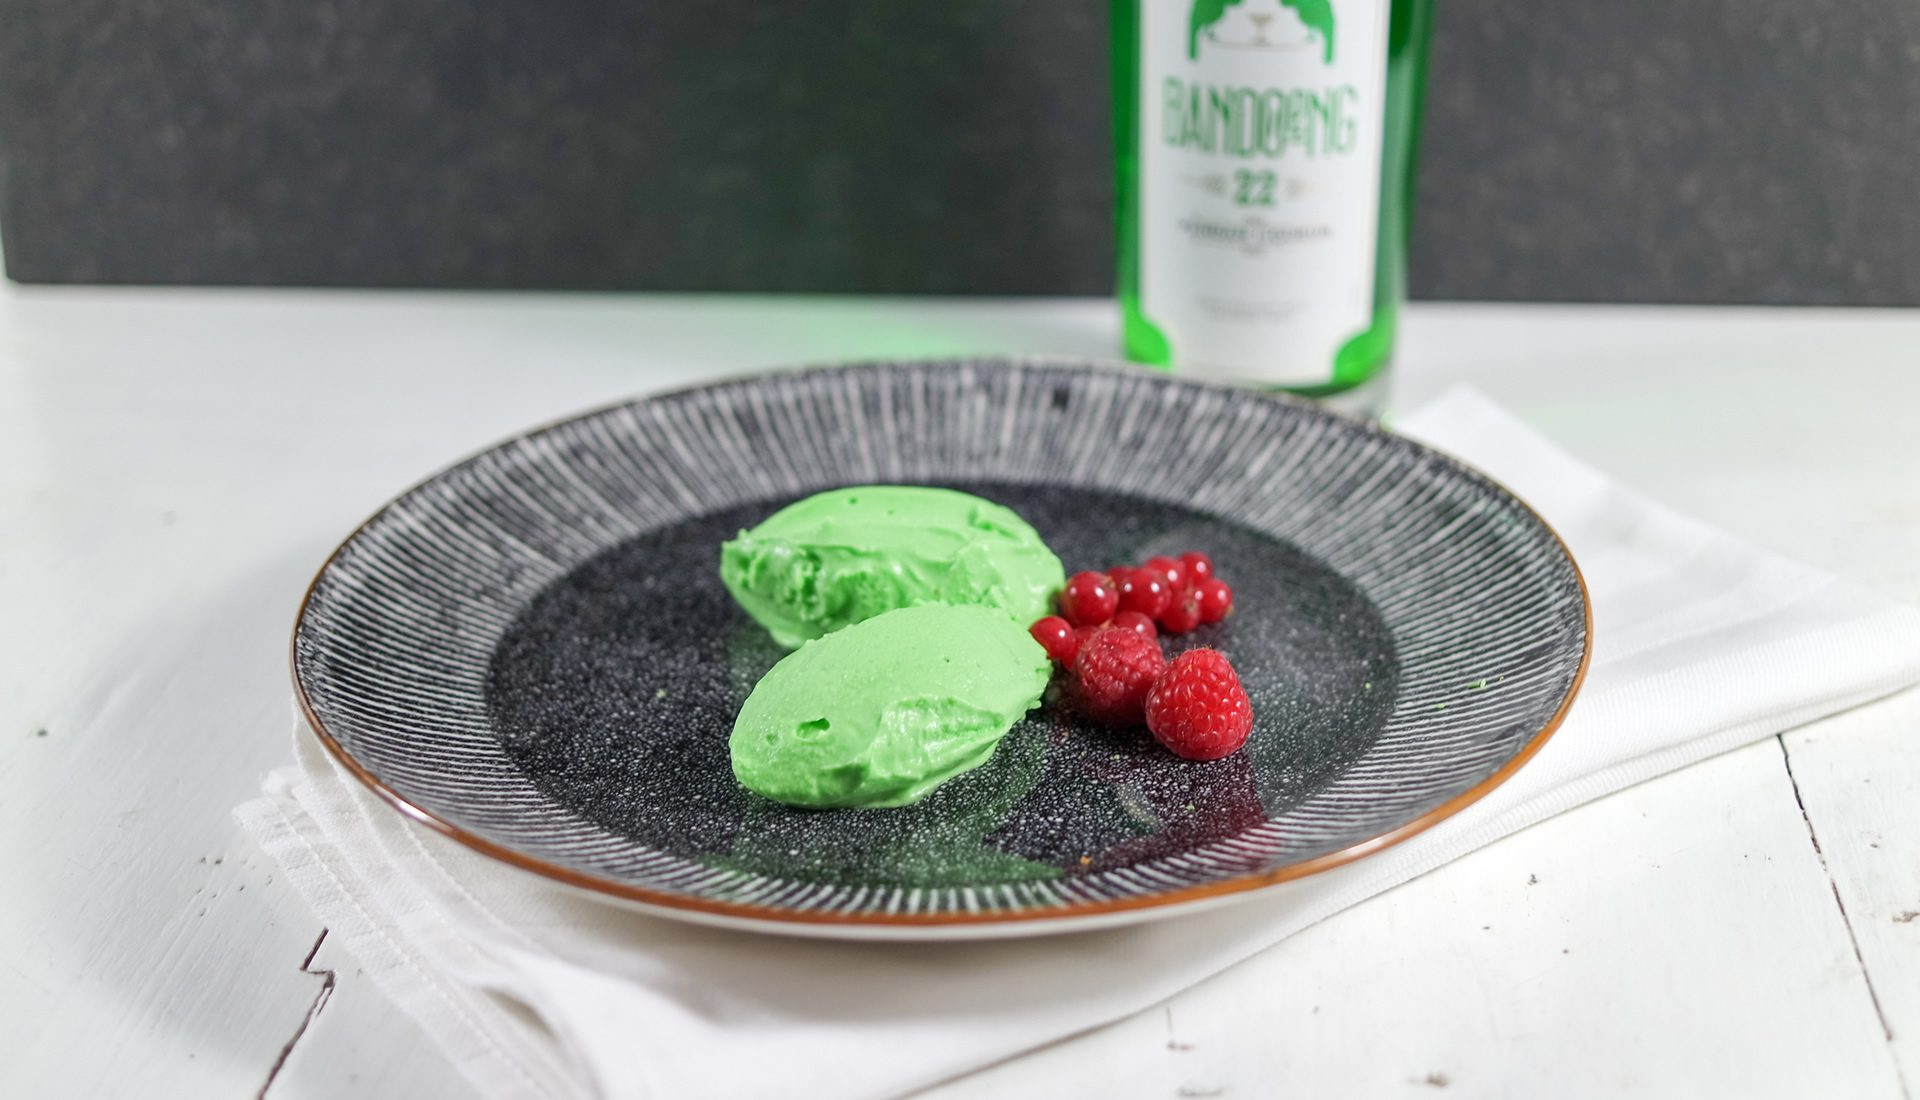 White chocolate mousse with Bandoeng'22 pandan liqueur